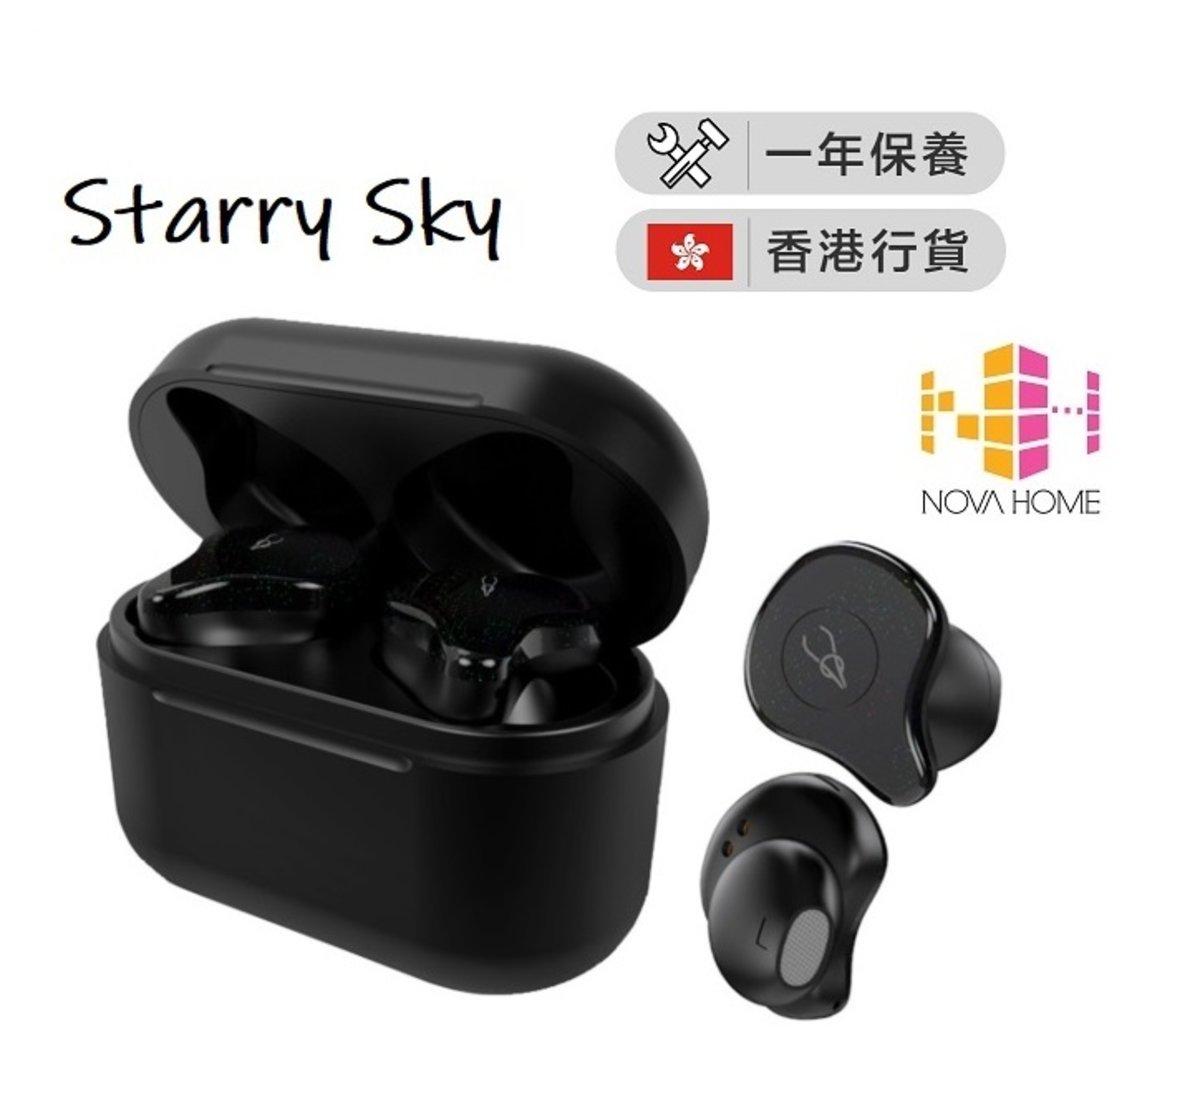 Sabbat X12 Pro 真無線藍芽耳機 星空 入耳式 藍牙耳機 Bluetooth 5.0 Handfree Earphone Earbuds